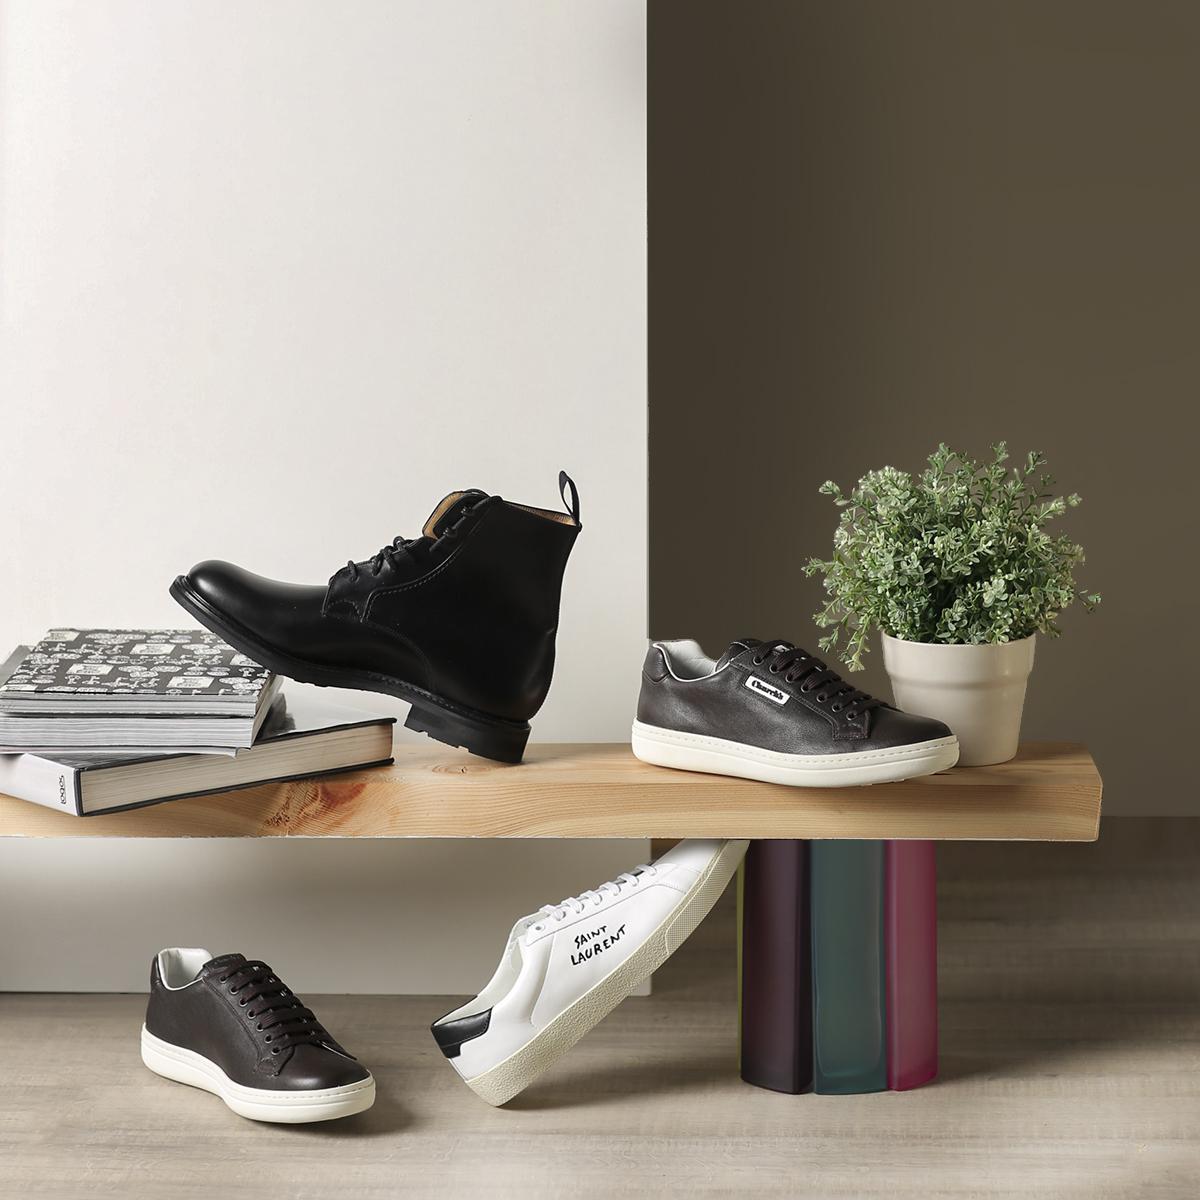 huge discount 42a6e f9901 Raffaello Network Outlet • Designer Mode Sale ...